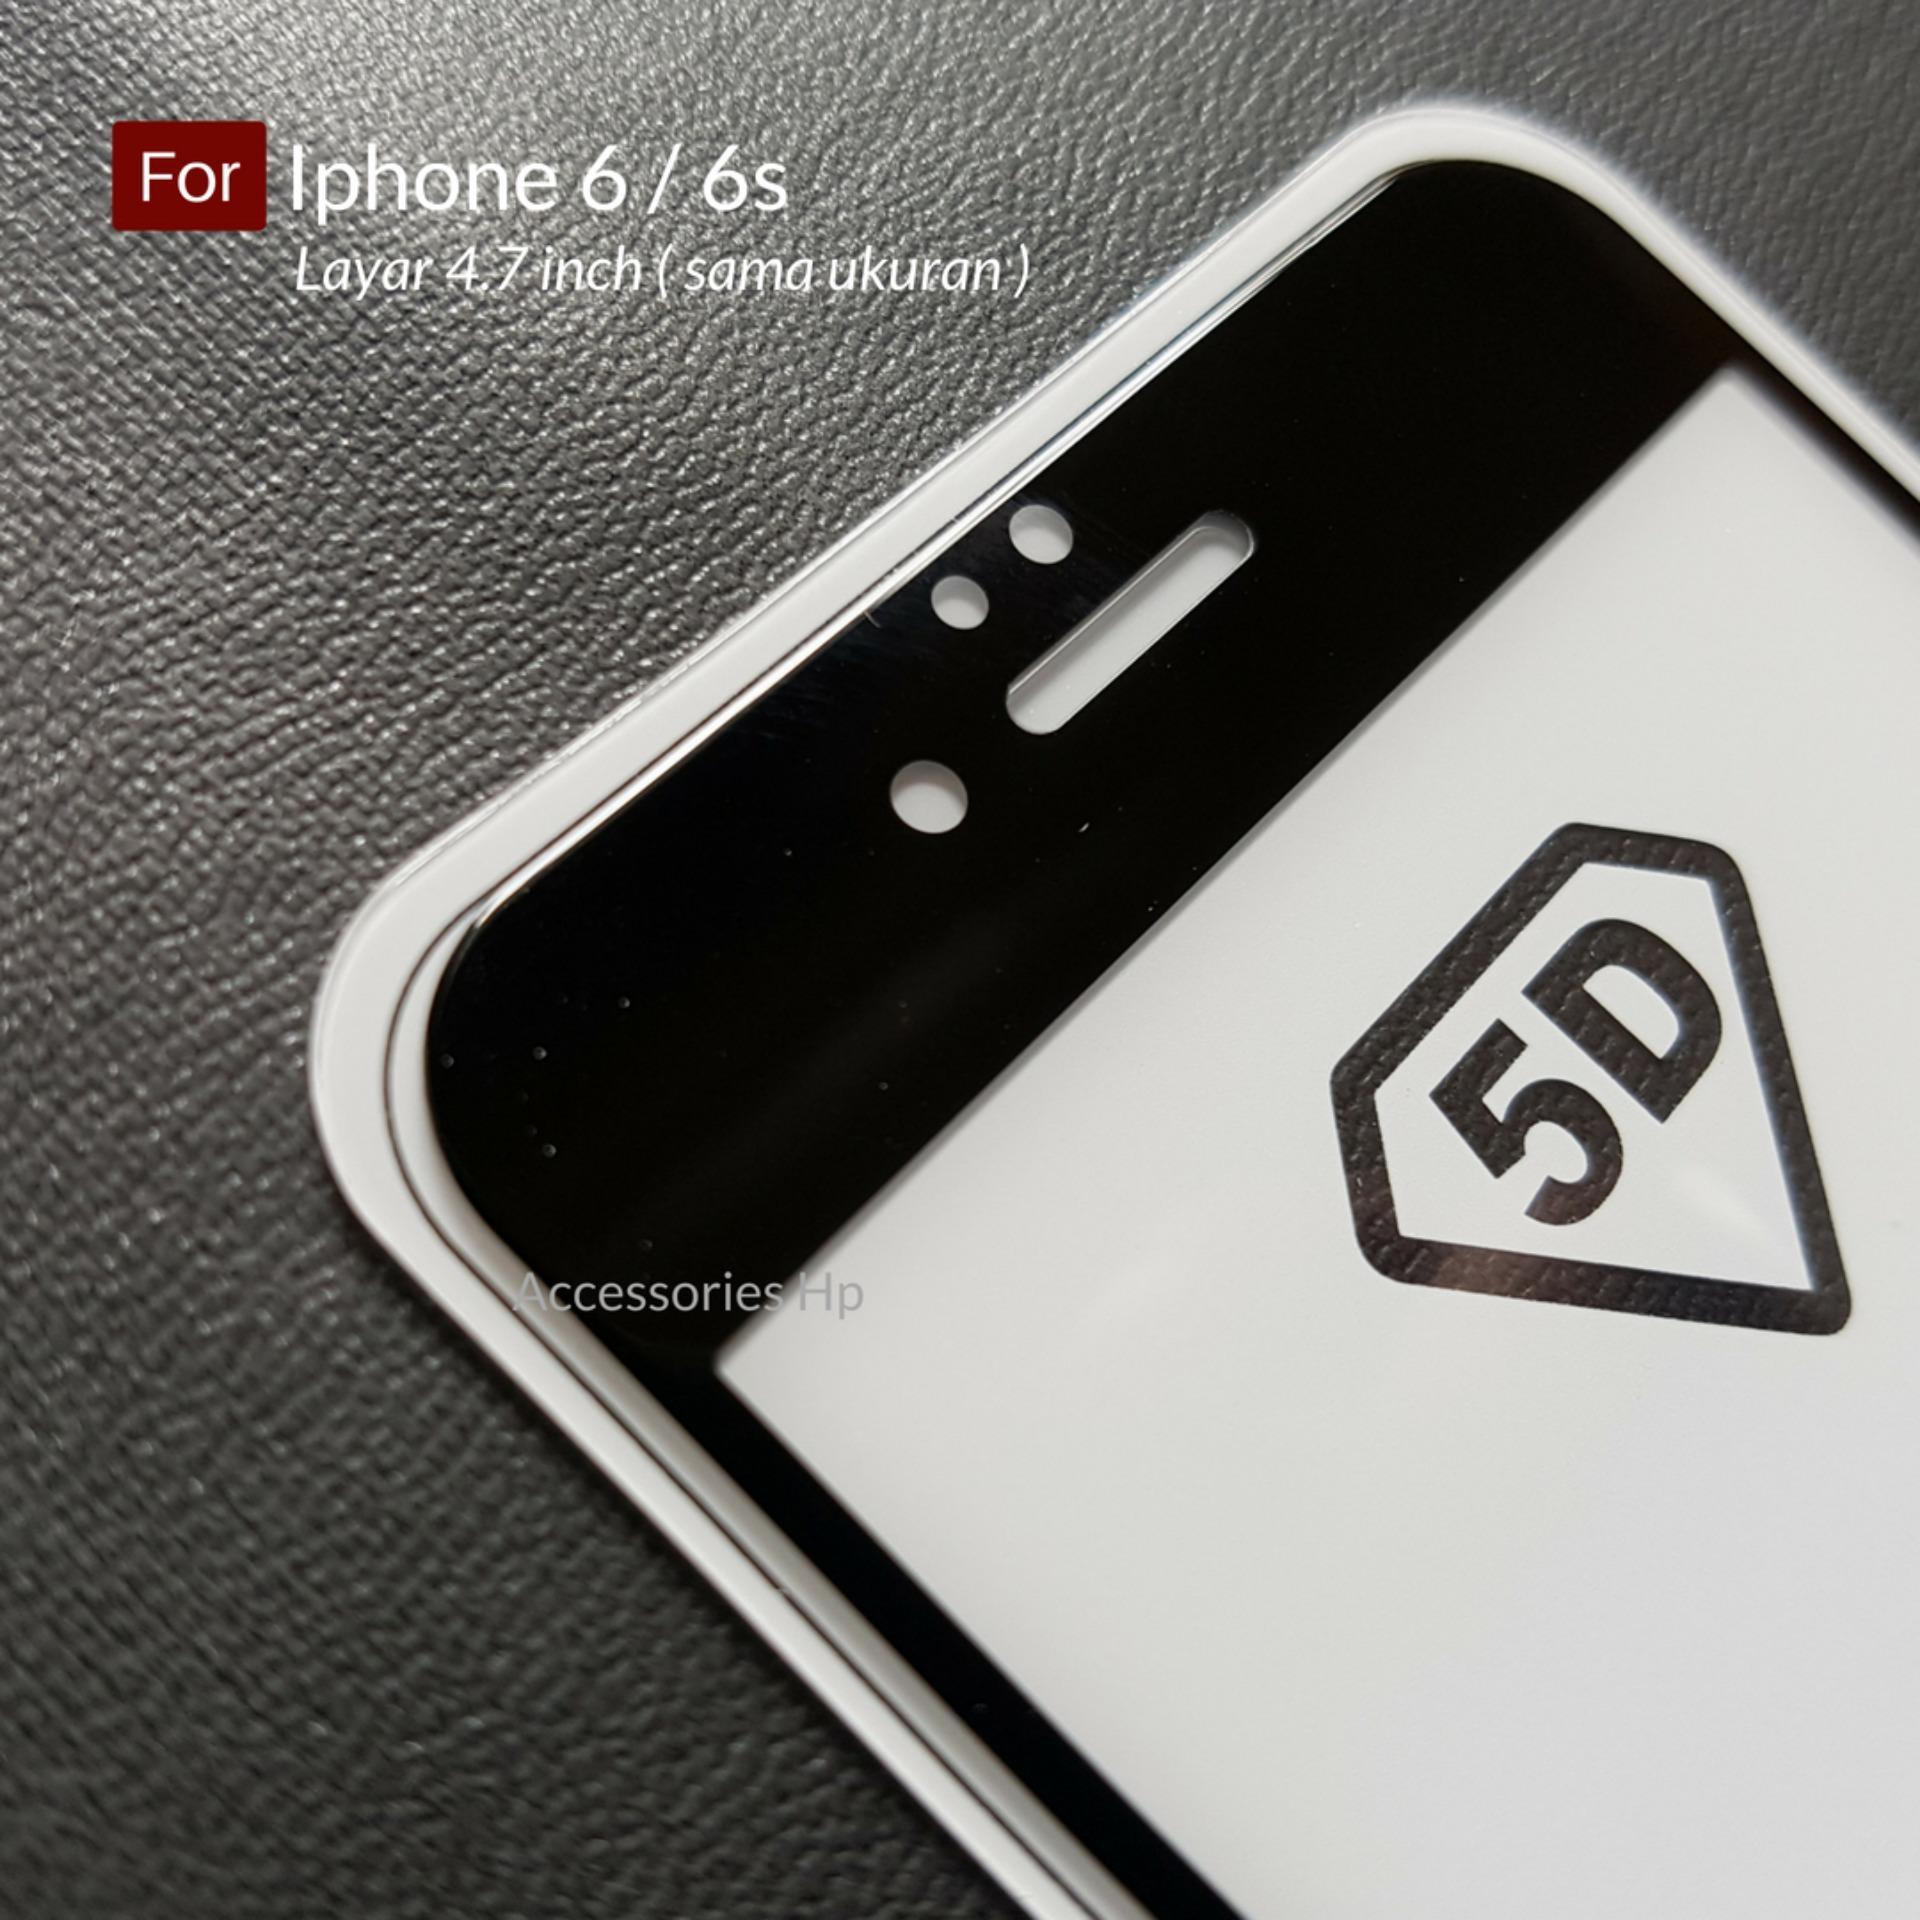 Ambigo Premium Tempered Glass 5D Full Cover Anti Gores Warna Kaca Full Lem For Iphone 6